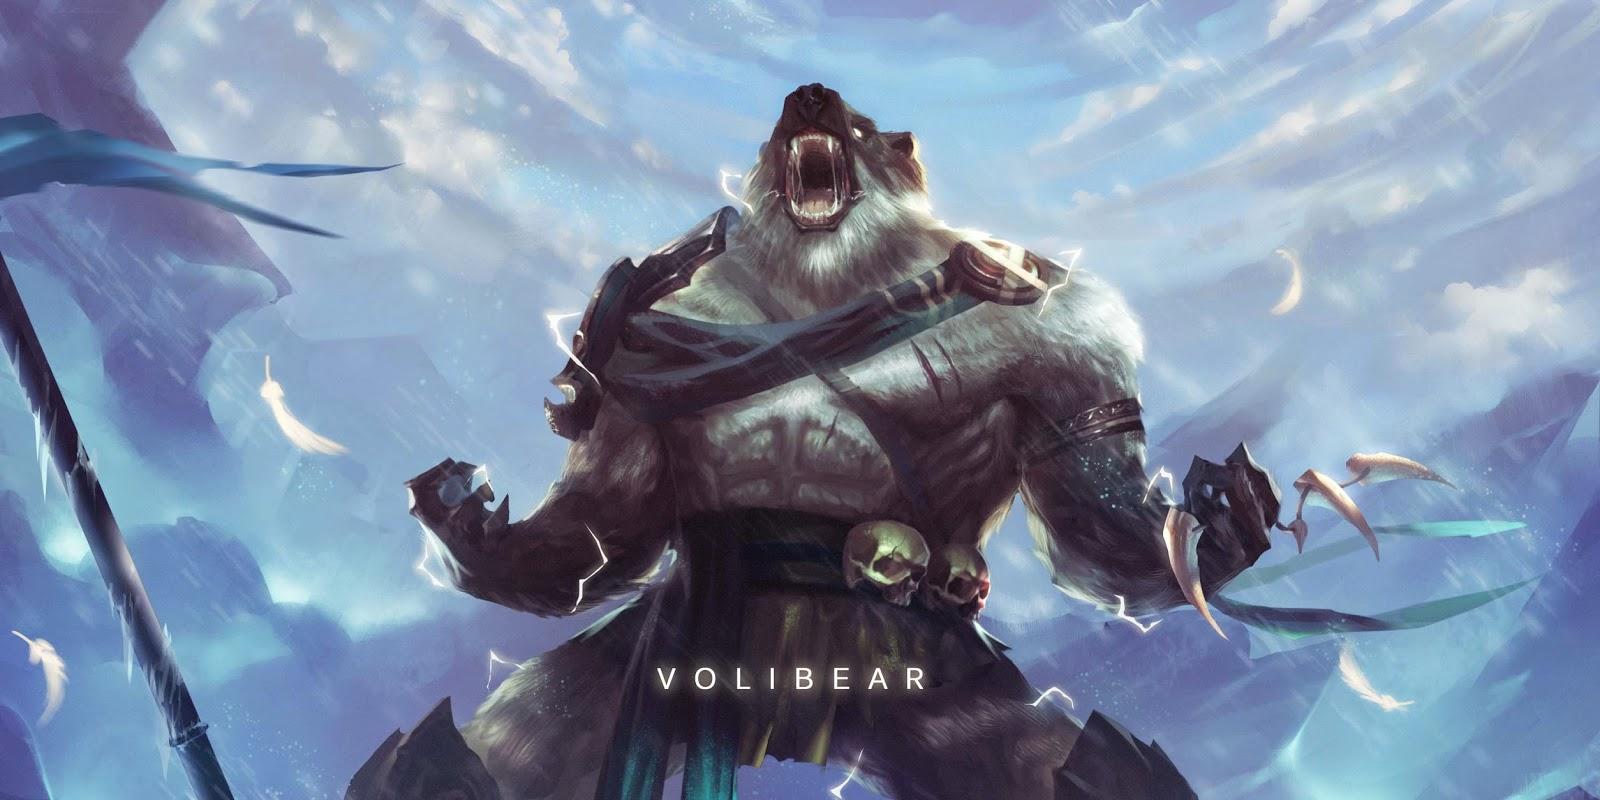 Lol Wallpapers: Volibear League Of Legends Wallpaper, Volibear Desktop